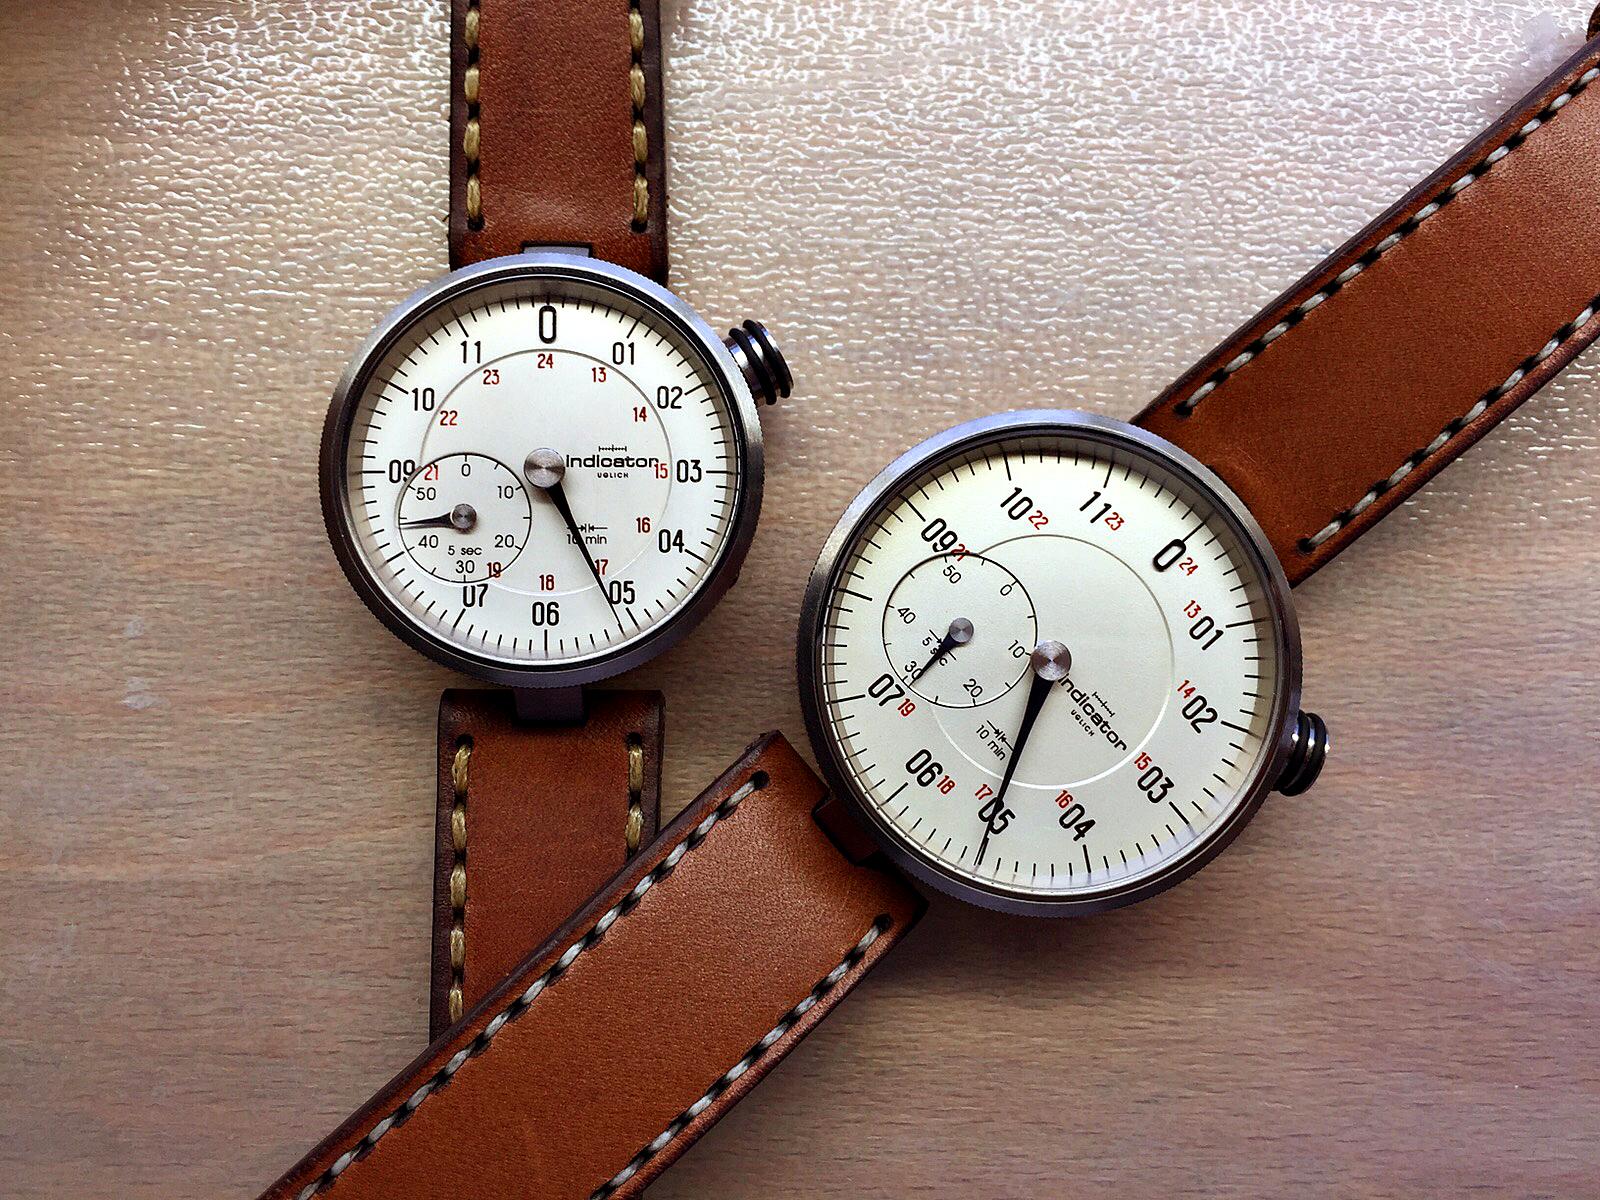 New RUSSIAN time tool INDICATOR-img-20151007-wa0009.jpg